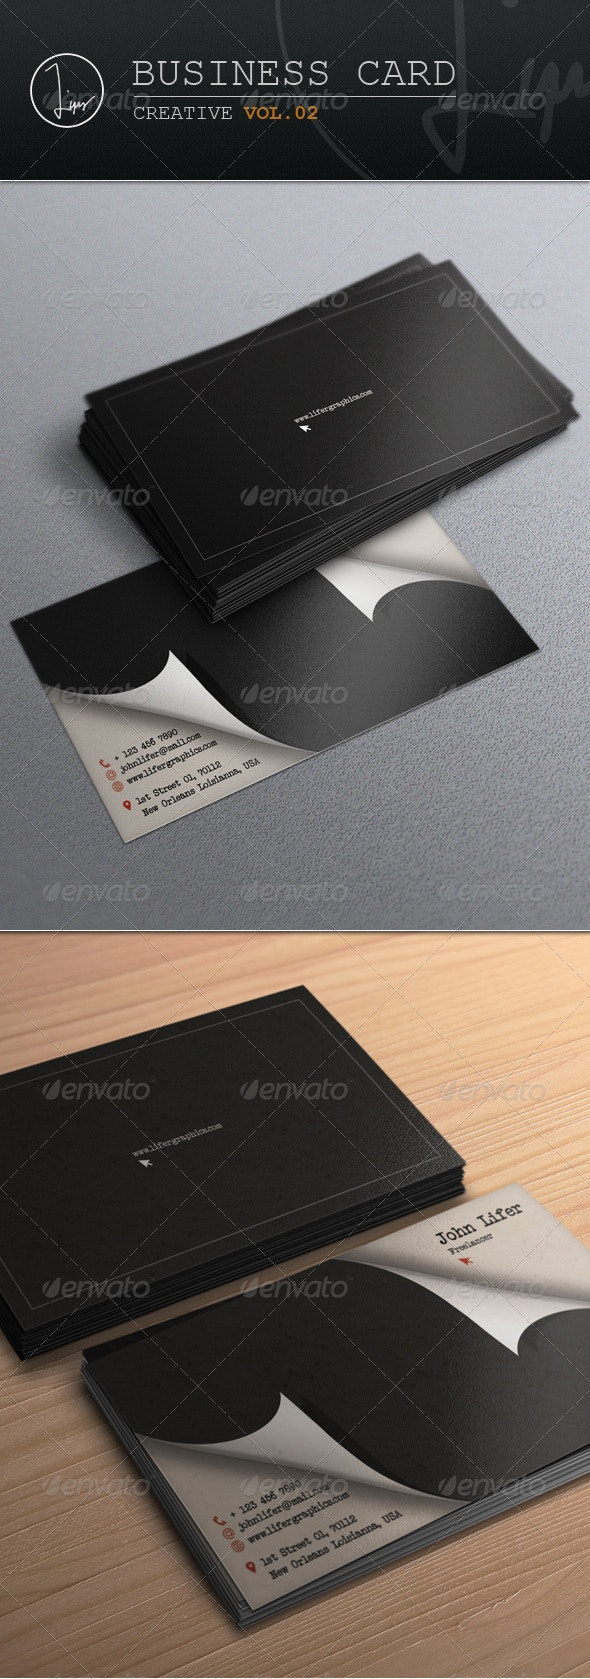 Business Card / Creative Vol.02 - Creative Business Cards